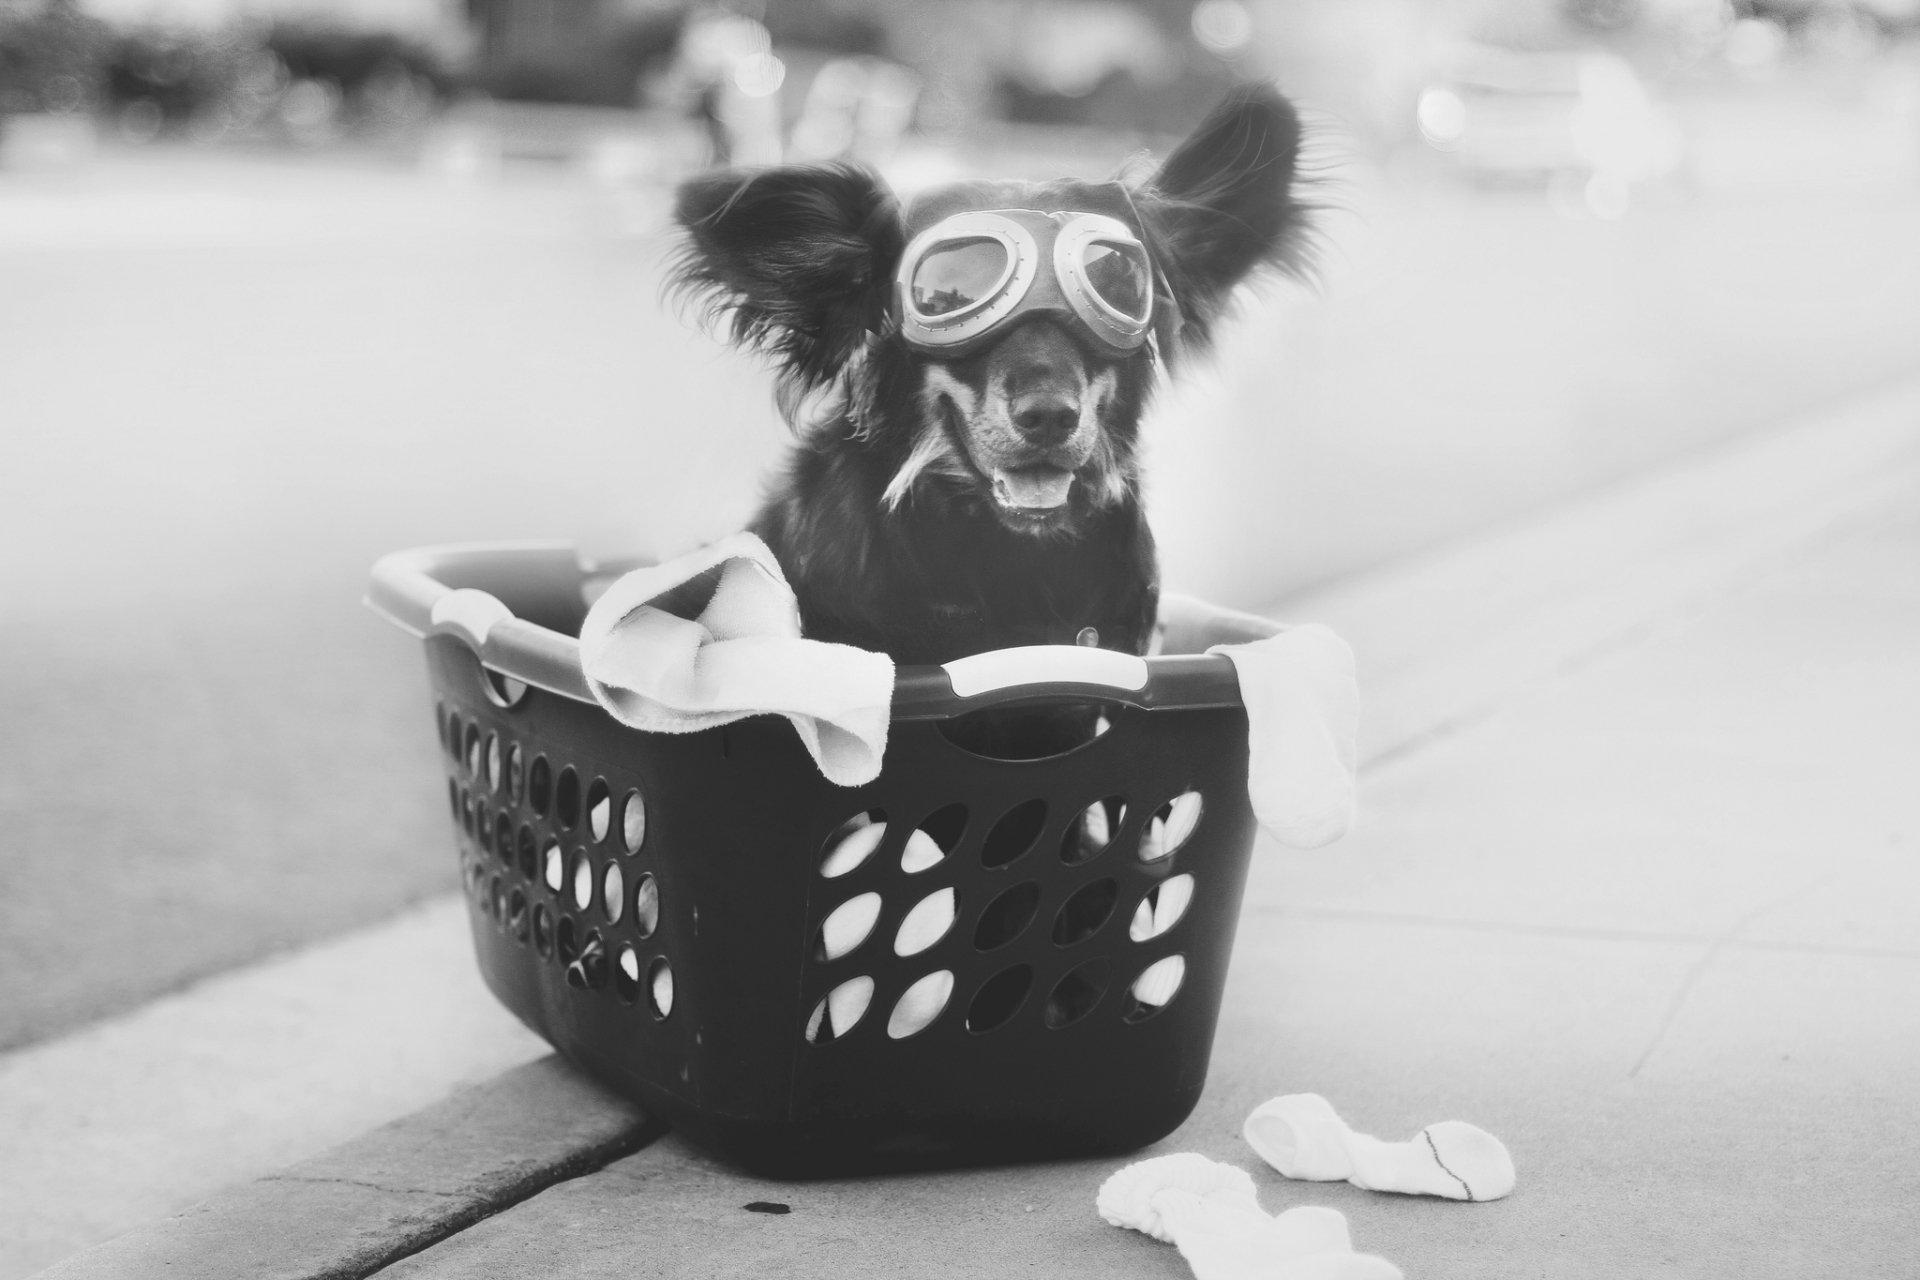 Animal - Australian Shepherd  Dog Goggles Cute Funny Black & White Wallpaper